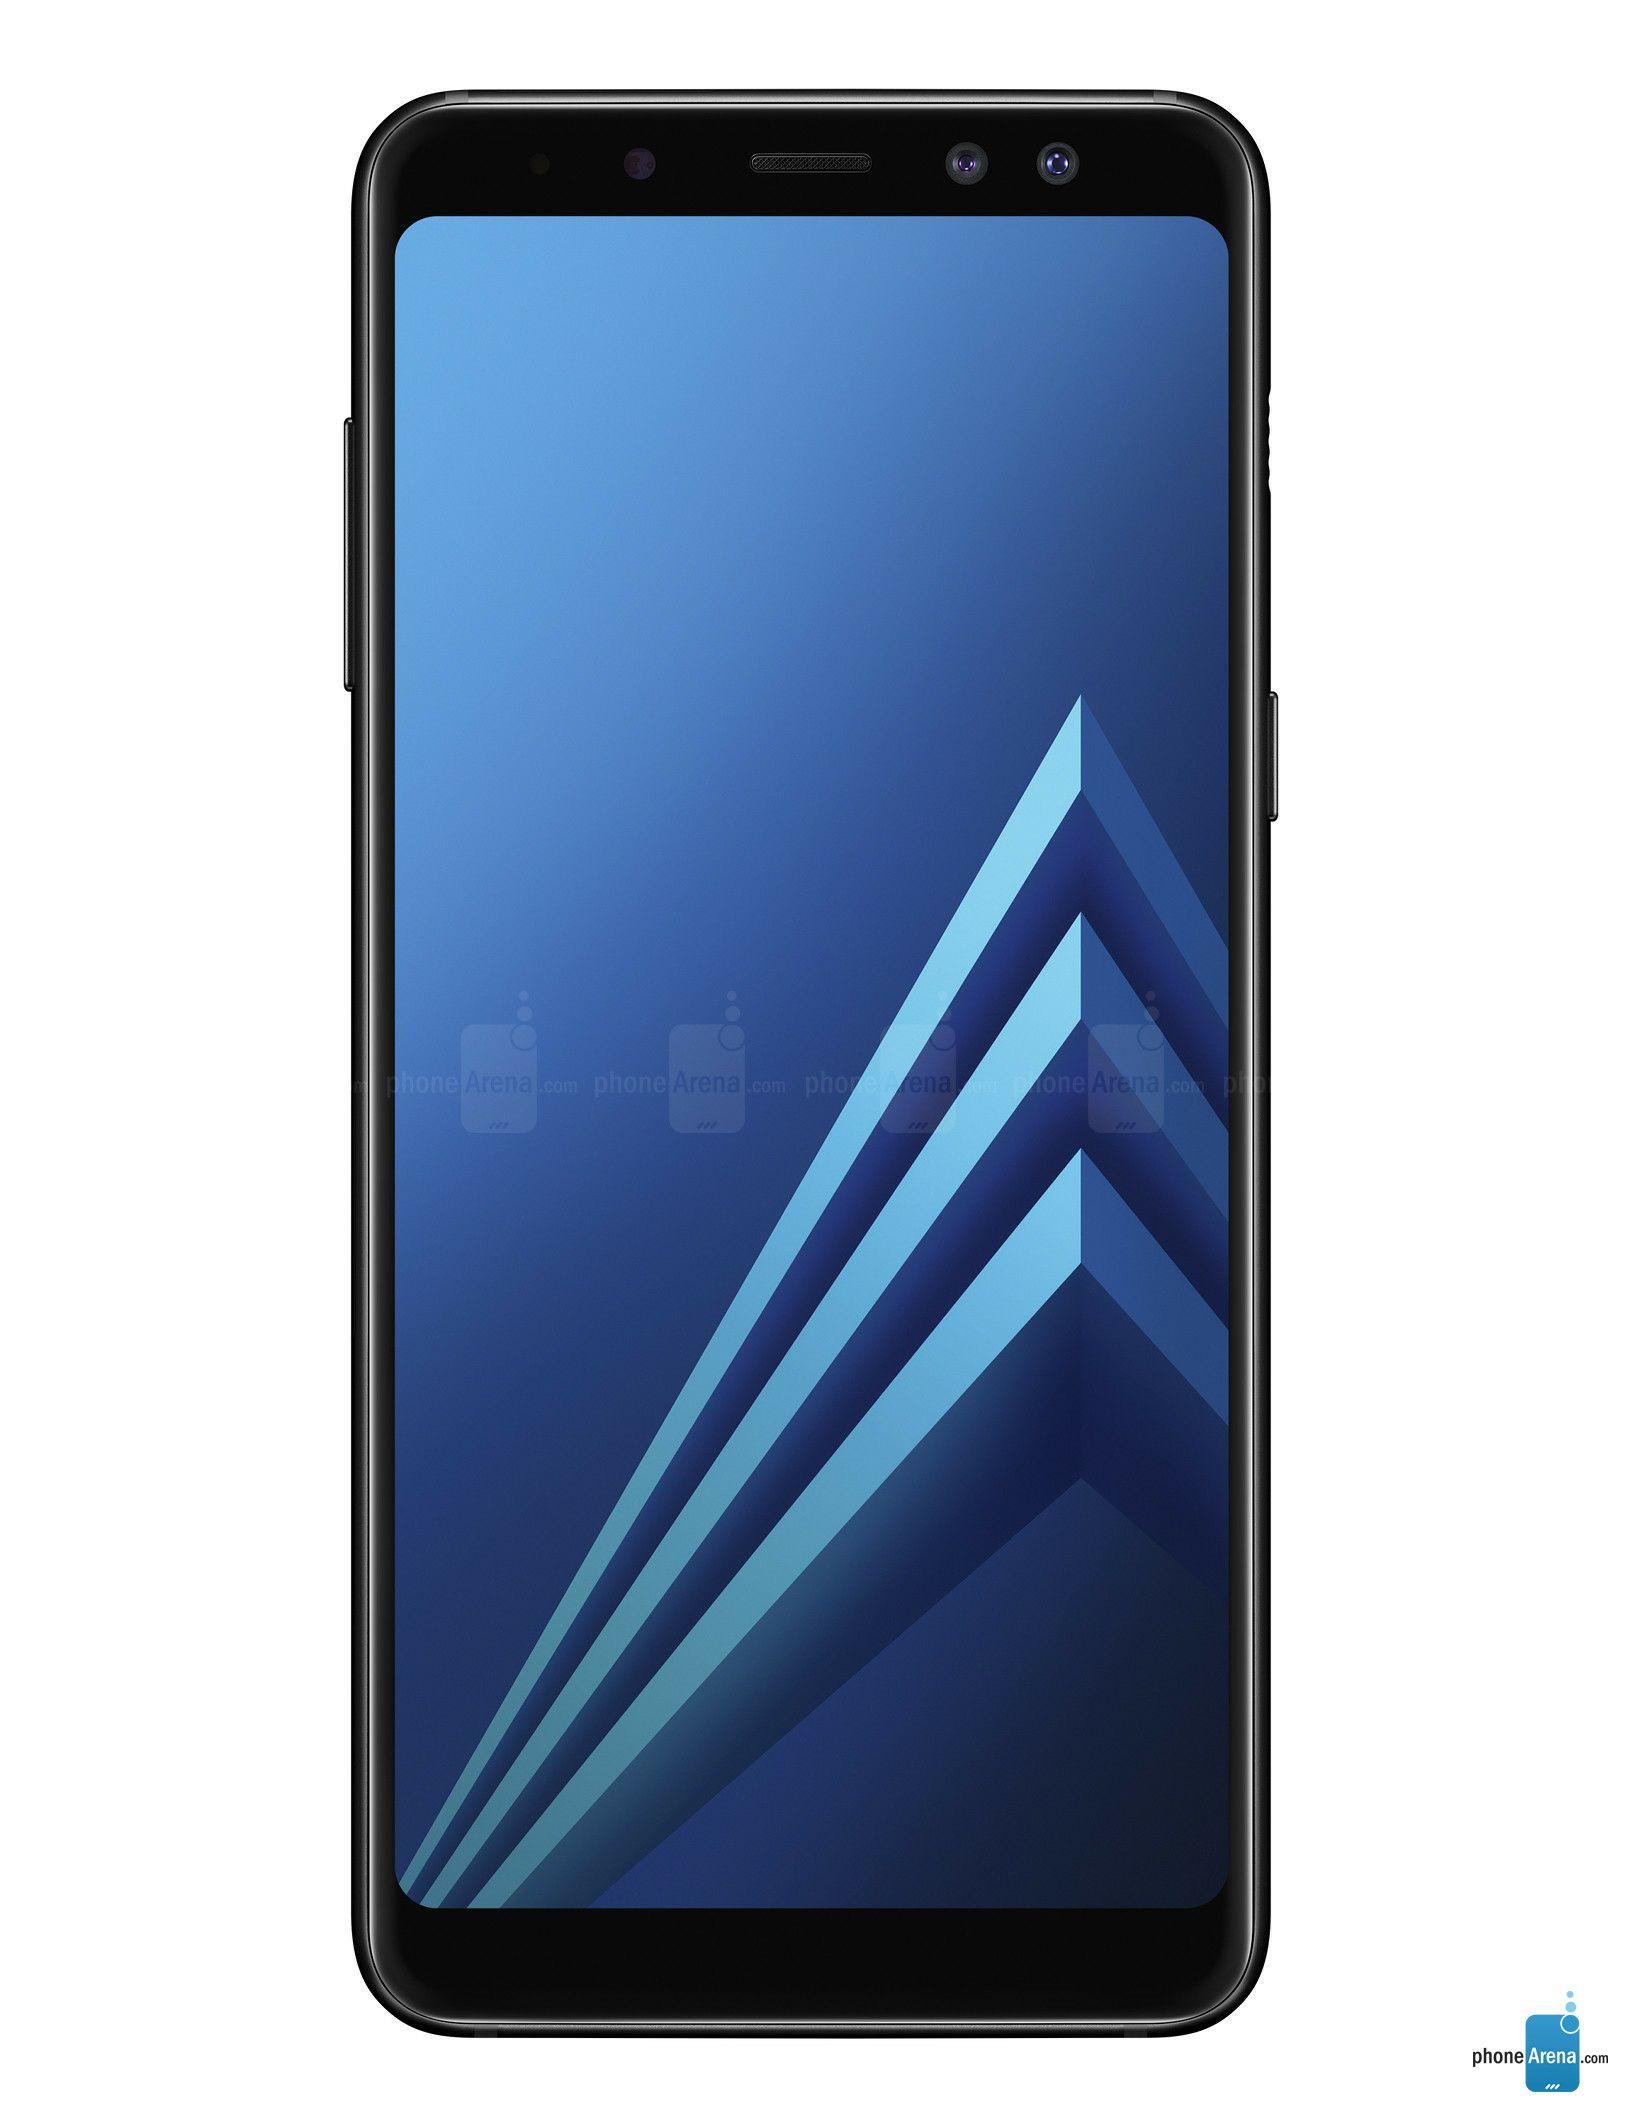 Galaxy A8 2018 Empik